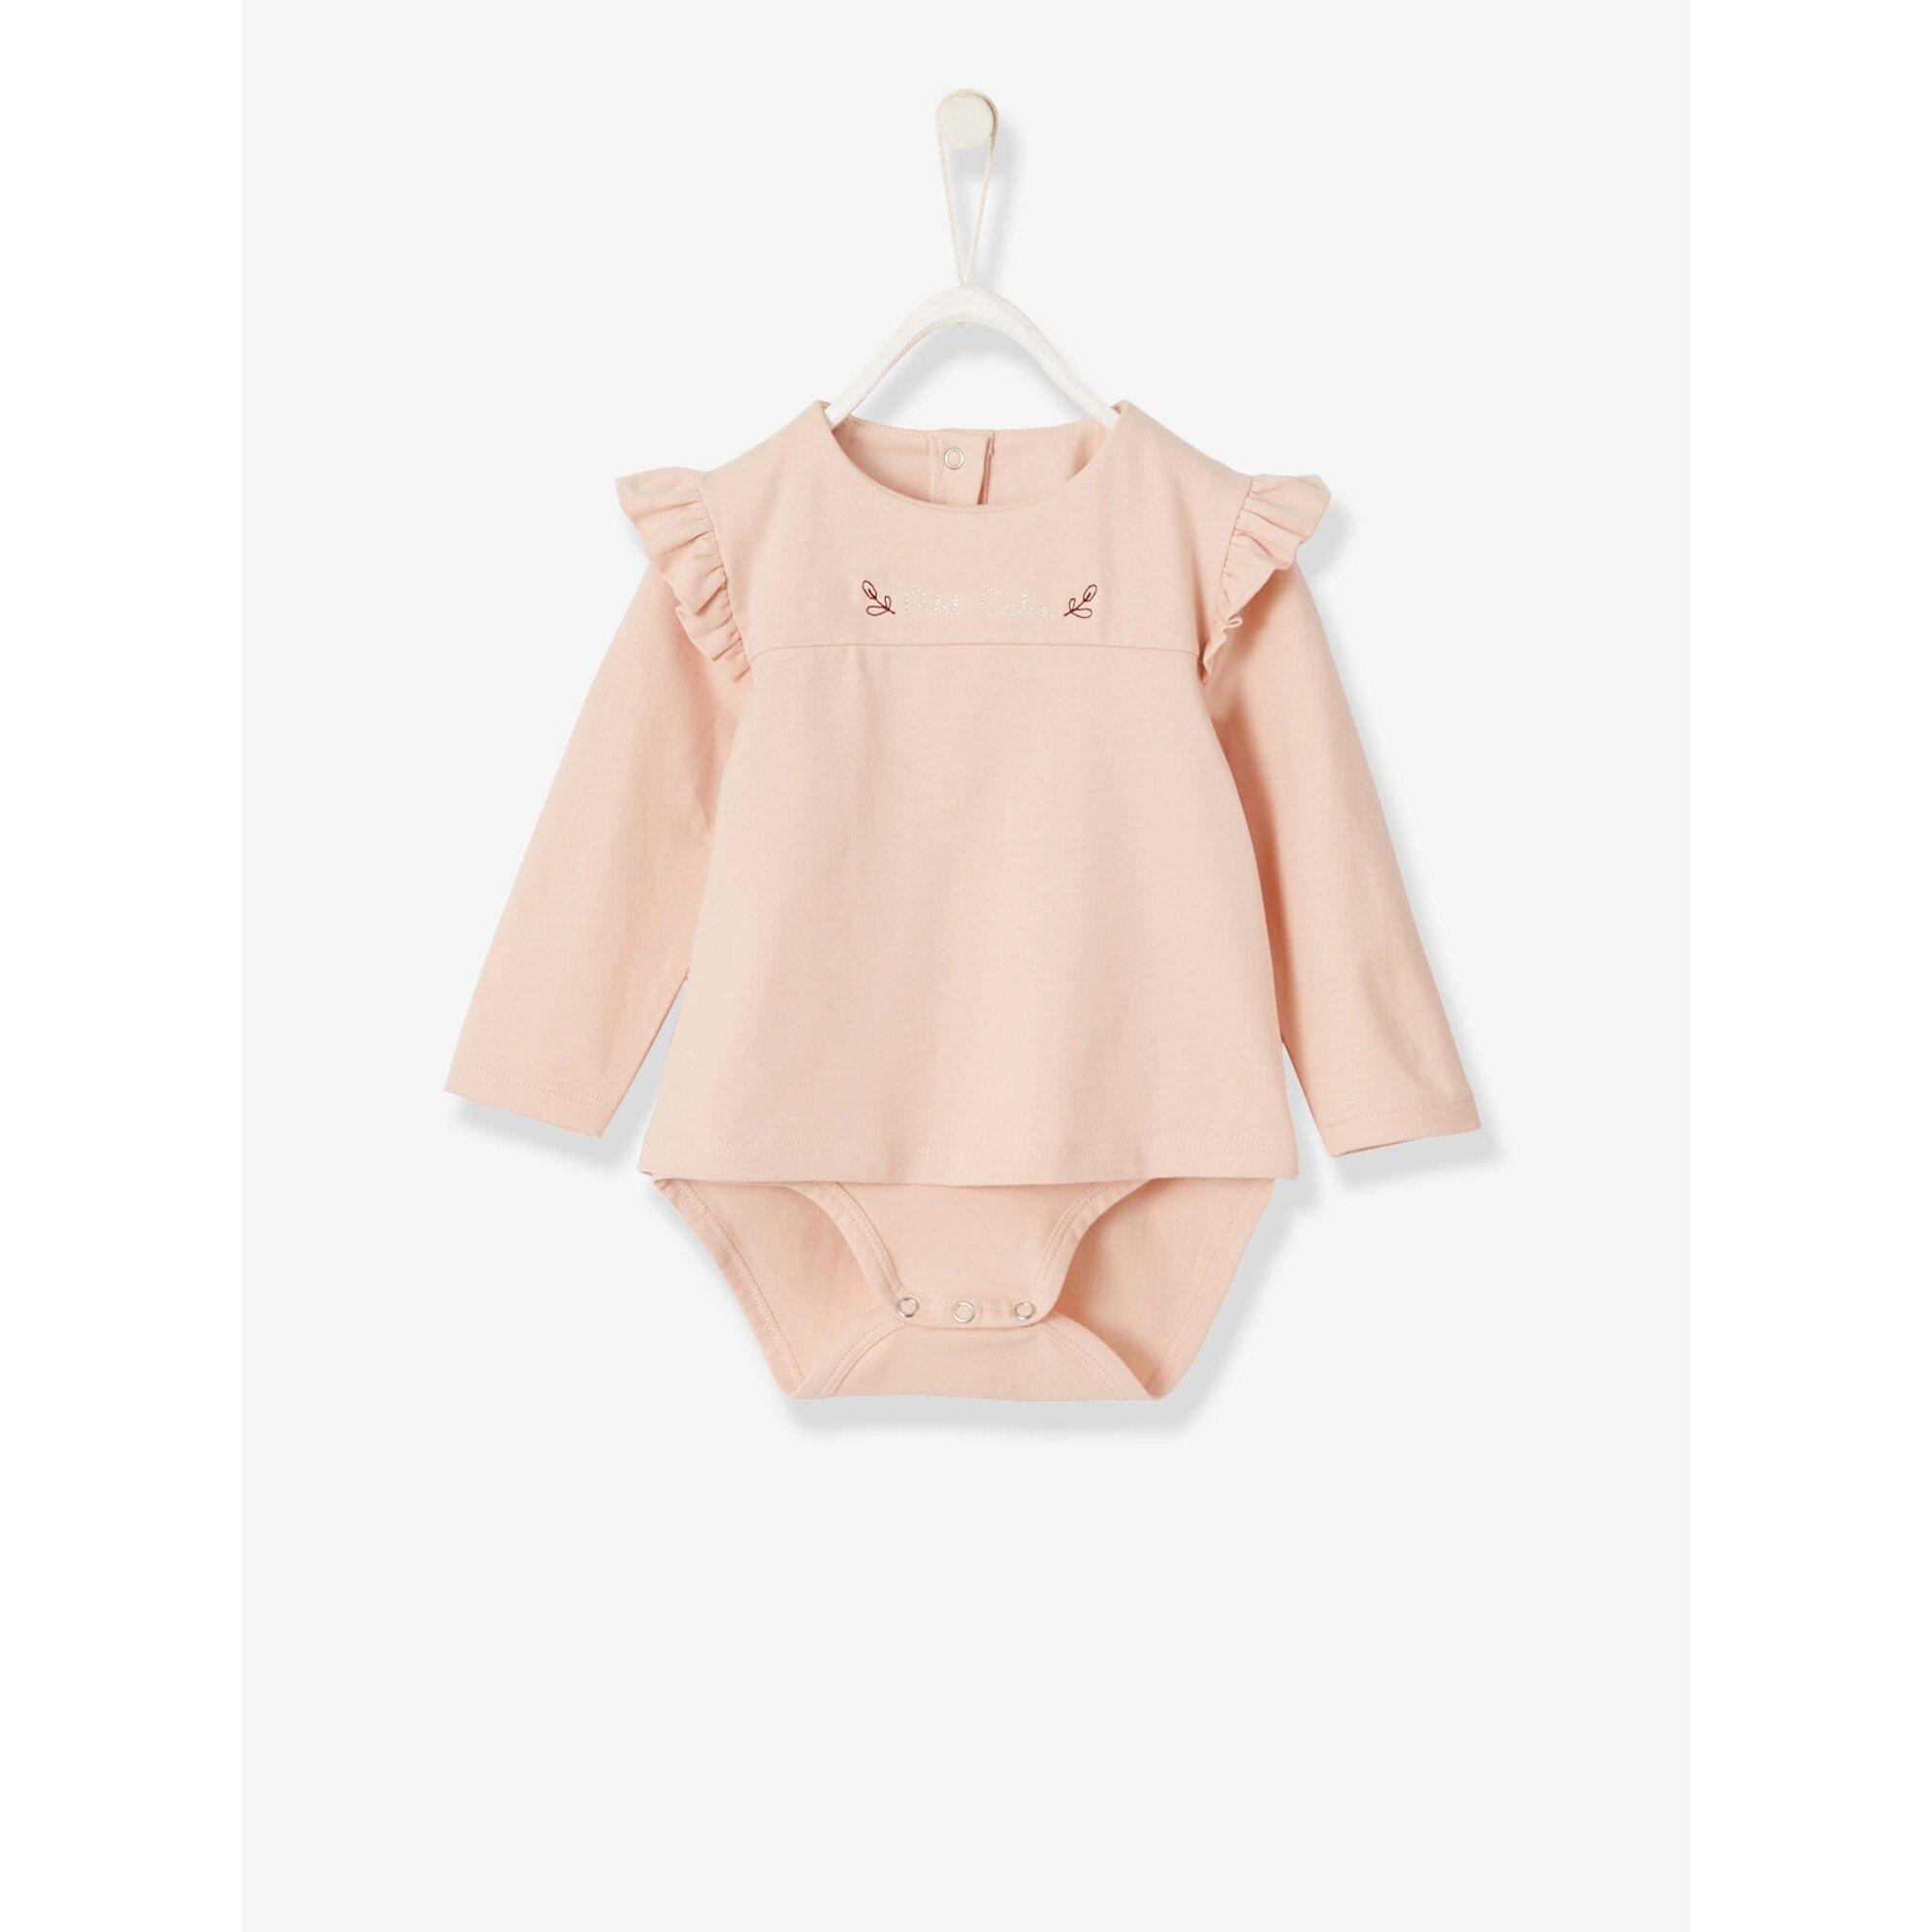 Vertbaudet Baby Shirt-Body mit Volants, Langarm